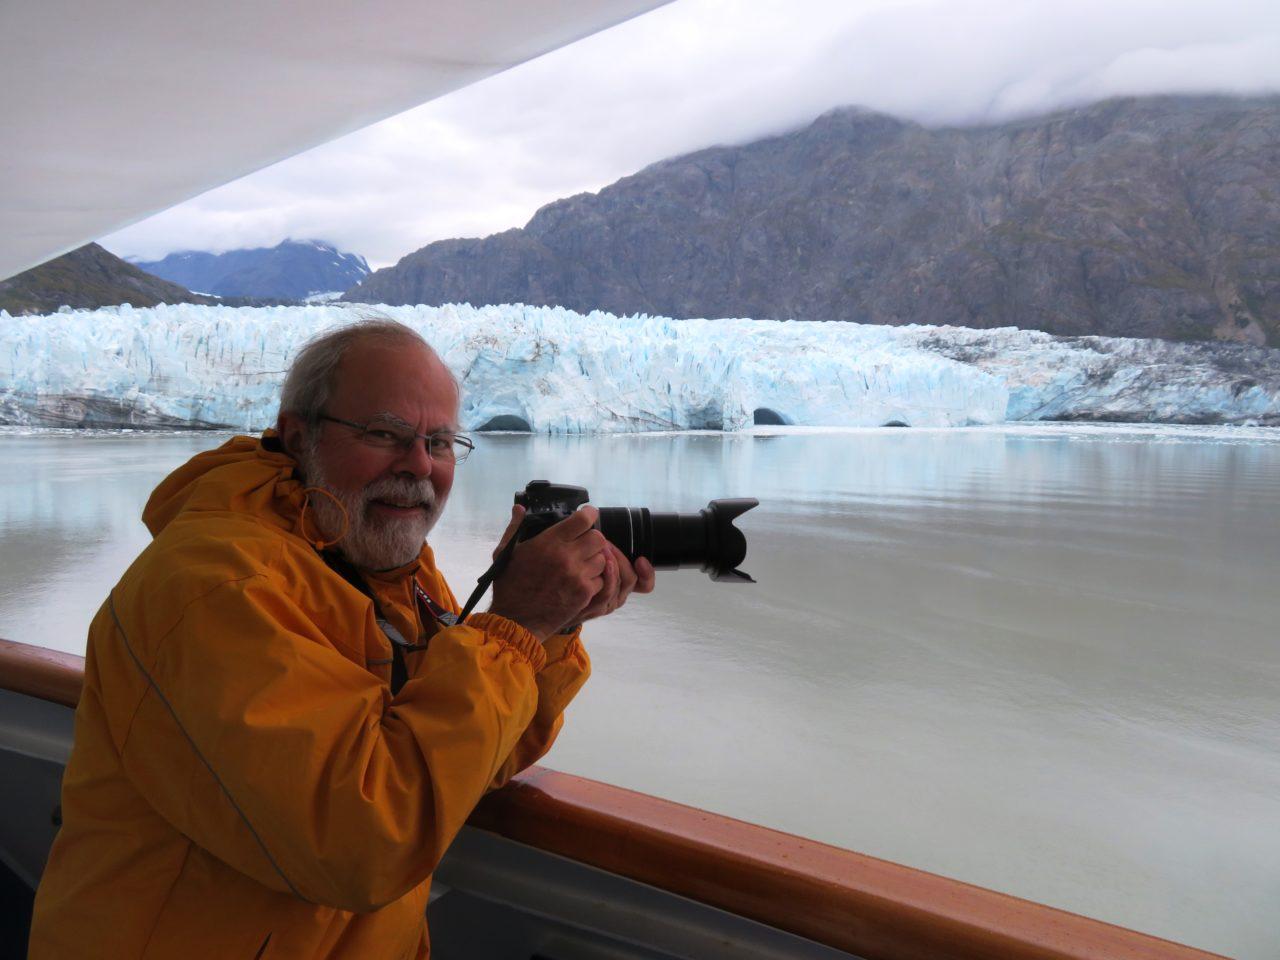 Louis-Simon enjoying Glacier Bay during our Alaska Cruise with Princess Cruises